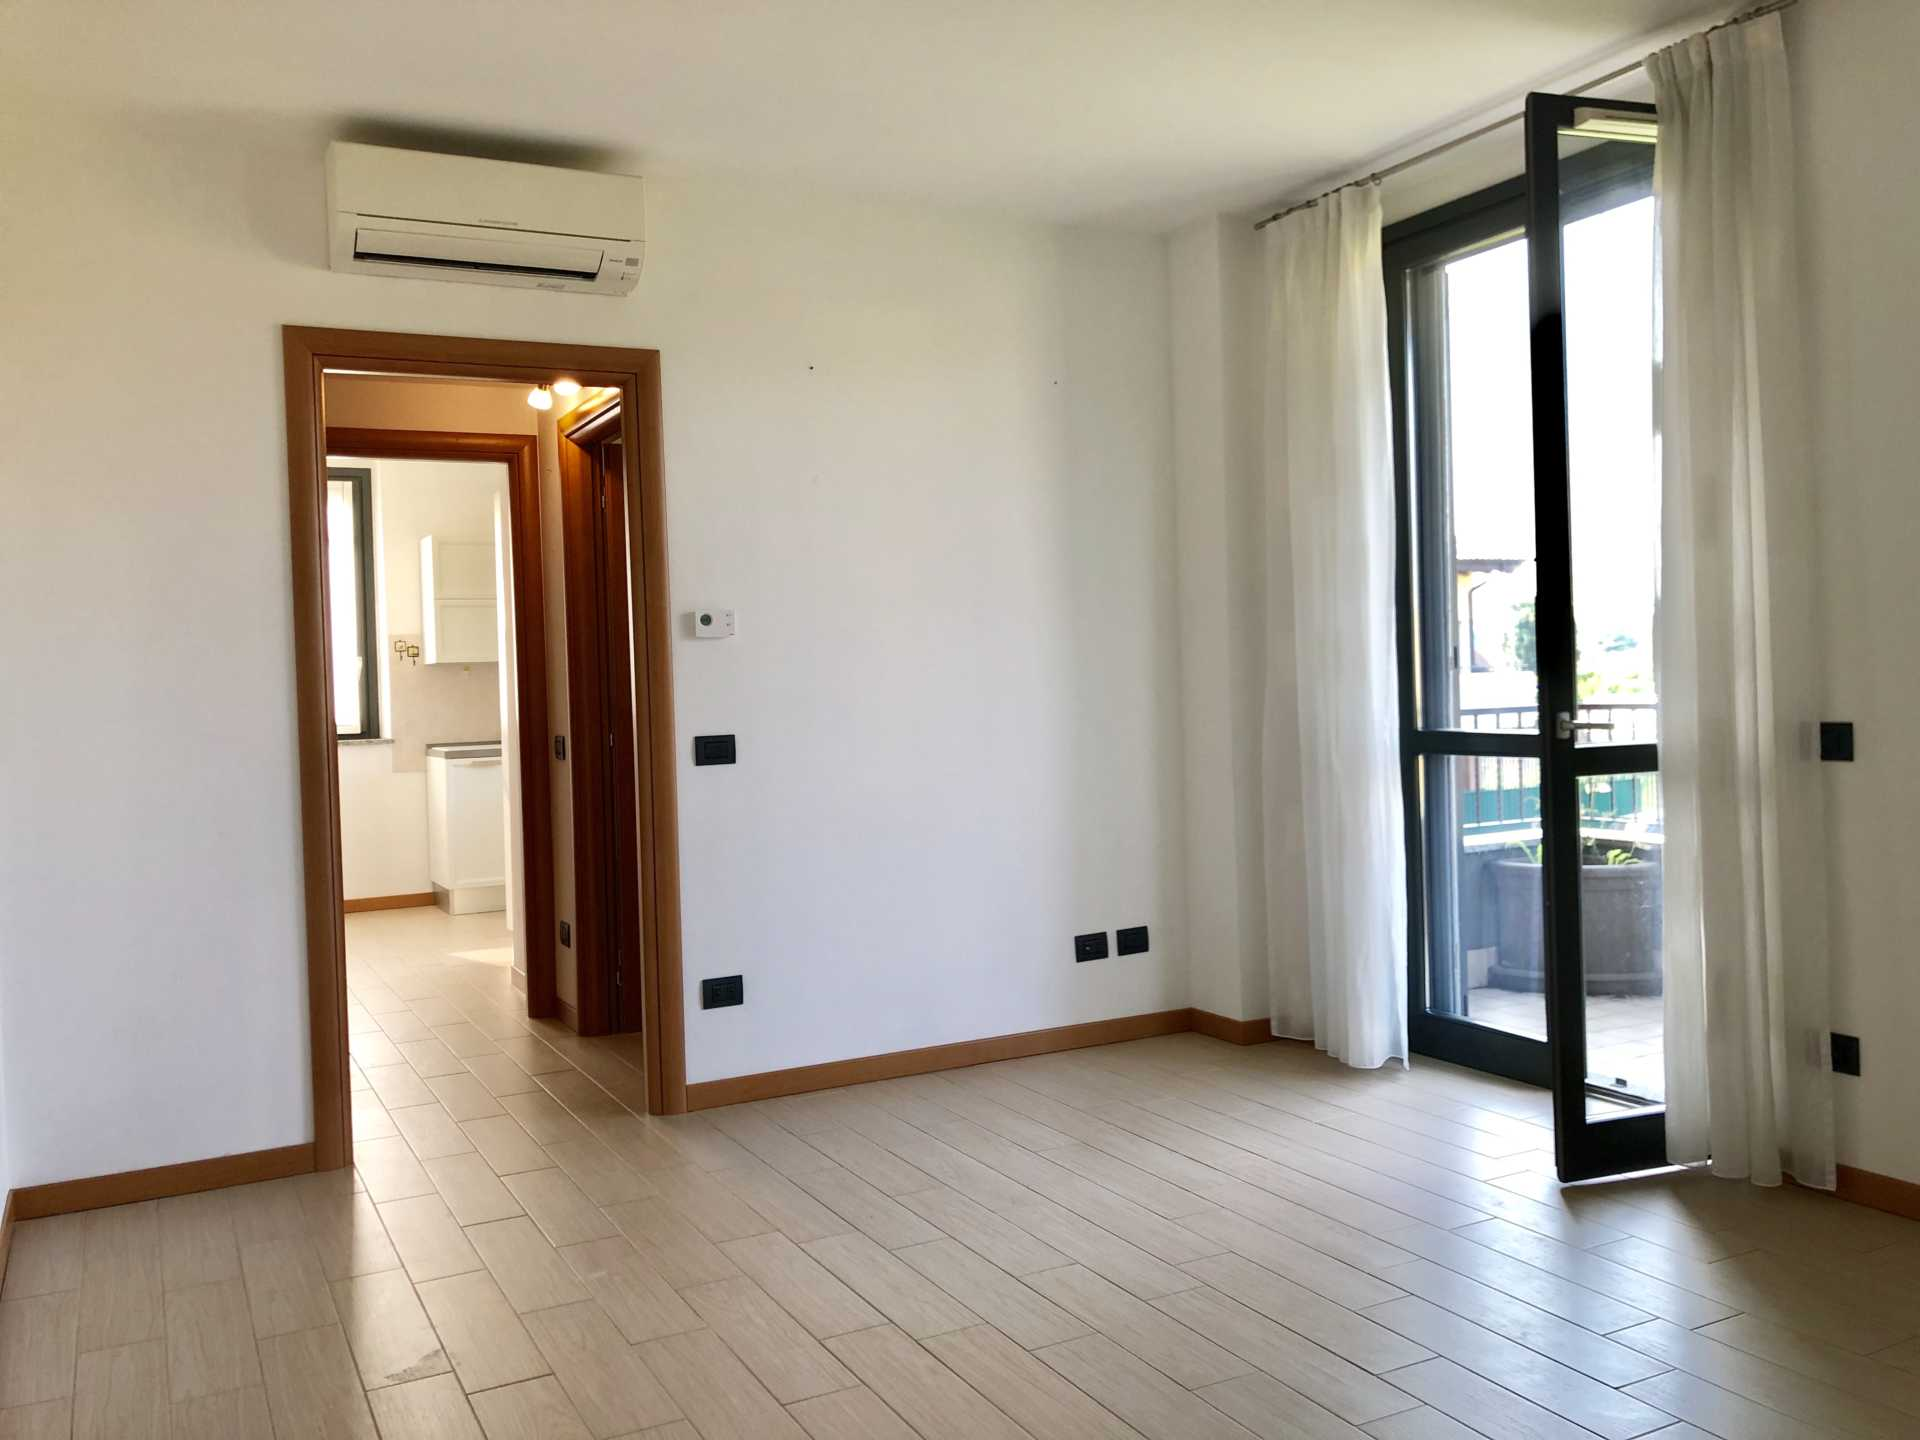 Appartamento-in-vendita-a-Cavenago (8)